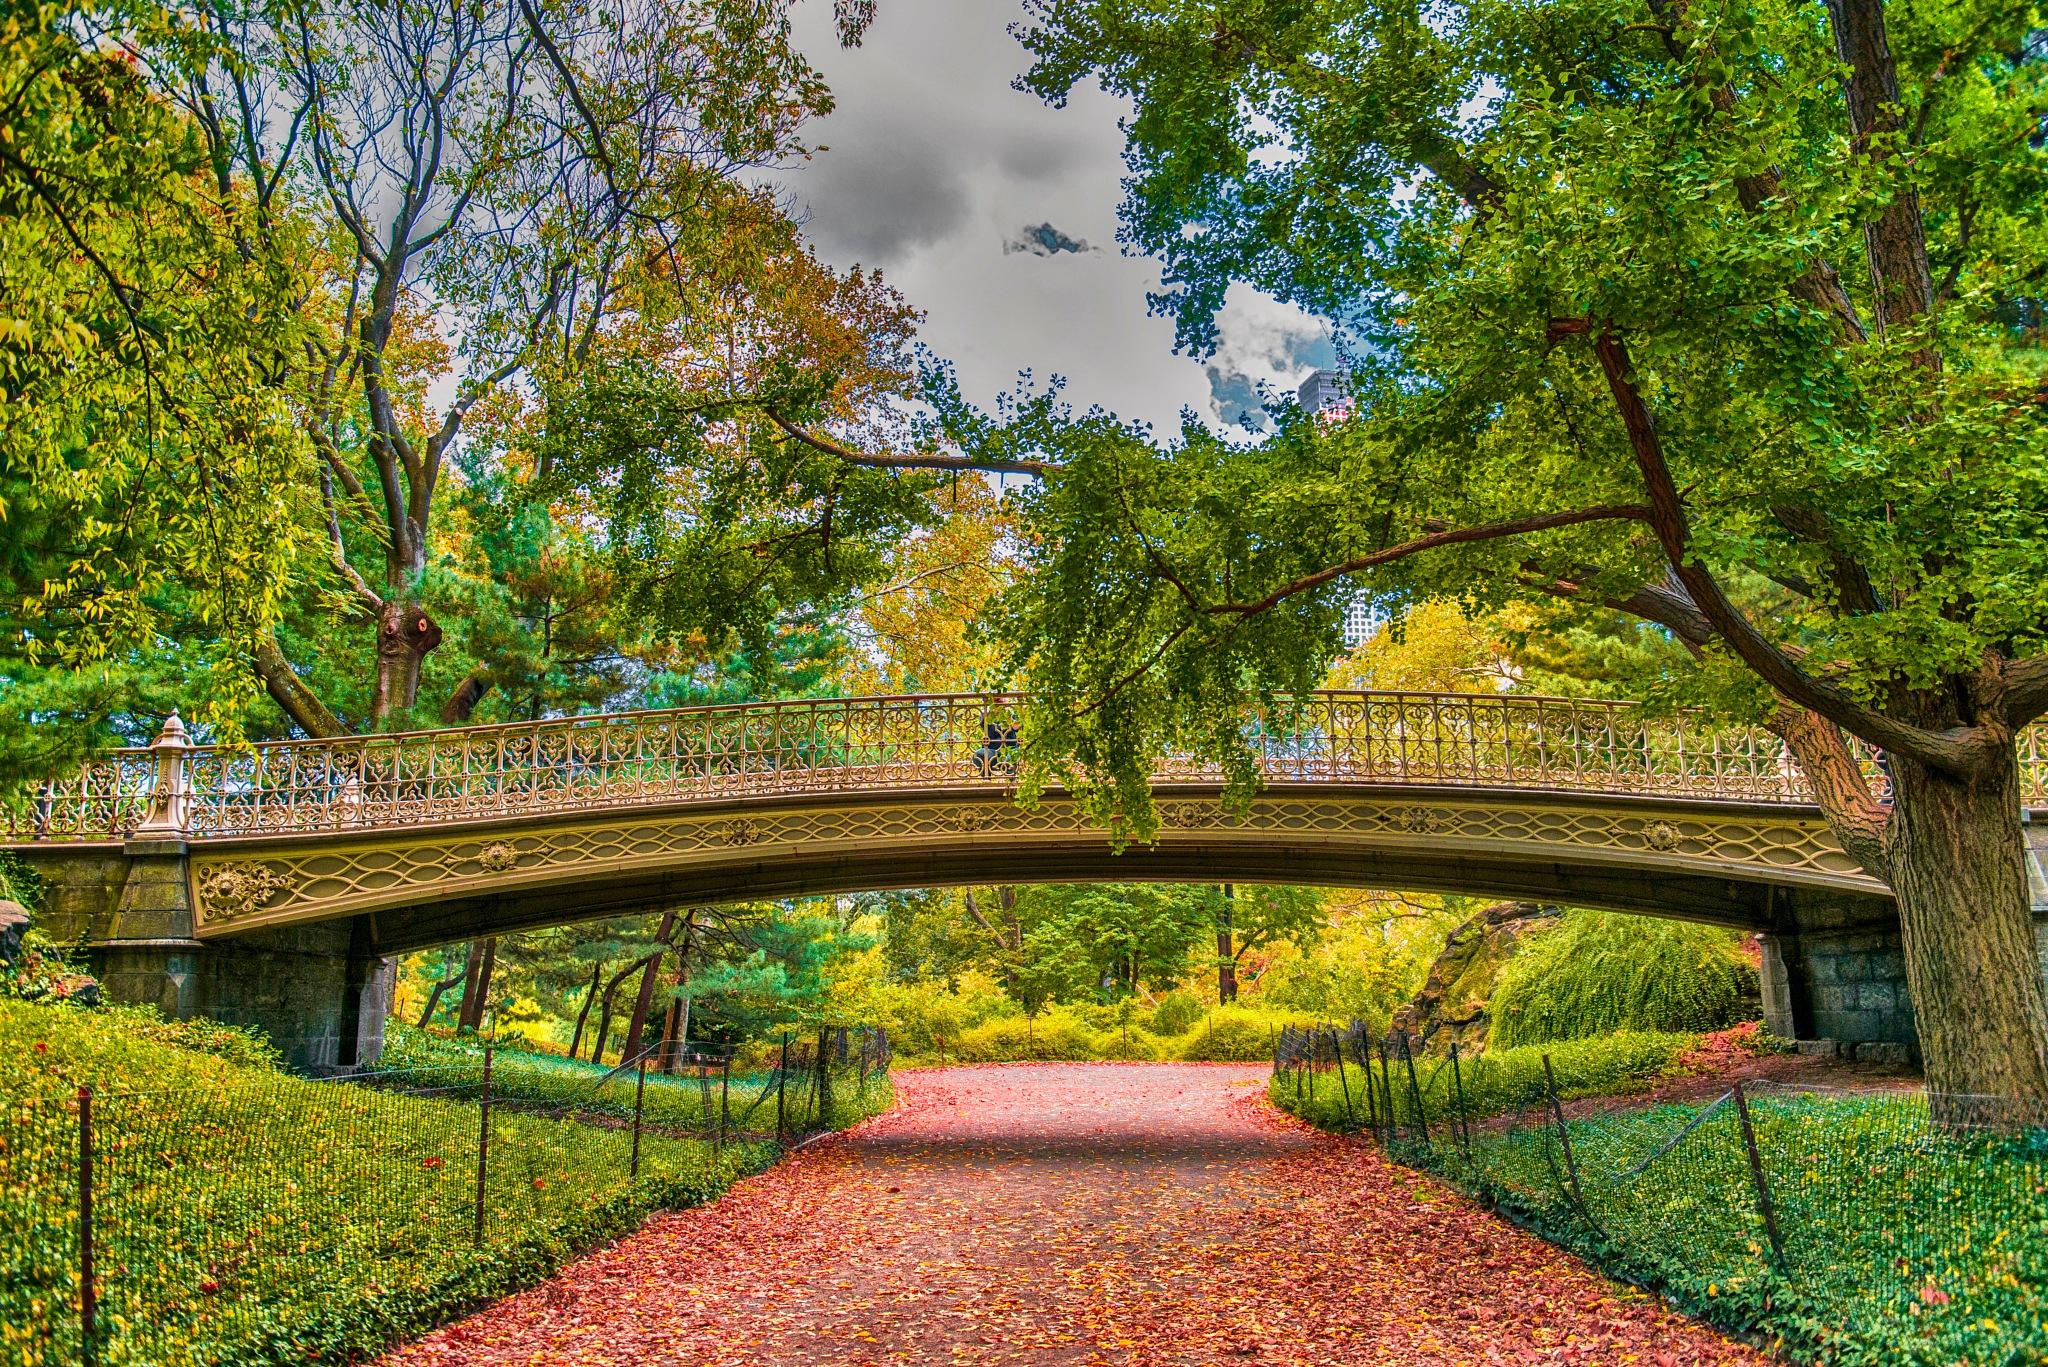 NY Central Park Pine Bank Bridge (62nd street)  by Manny D Suriel